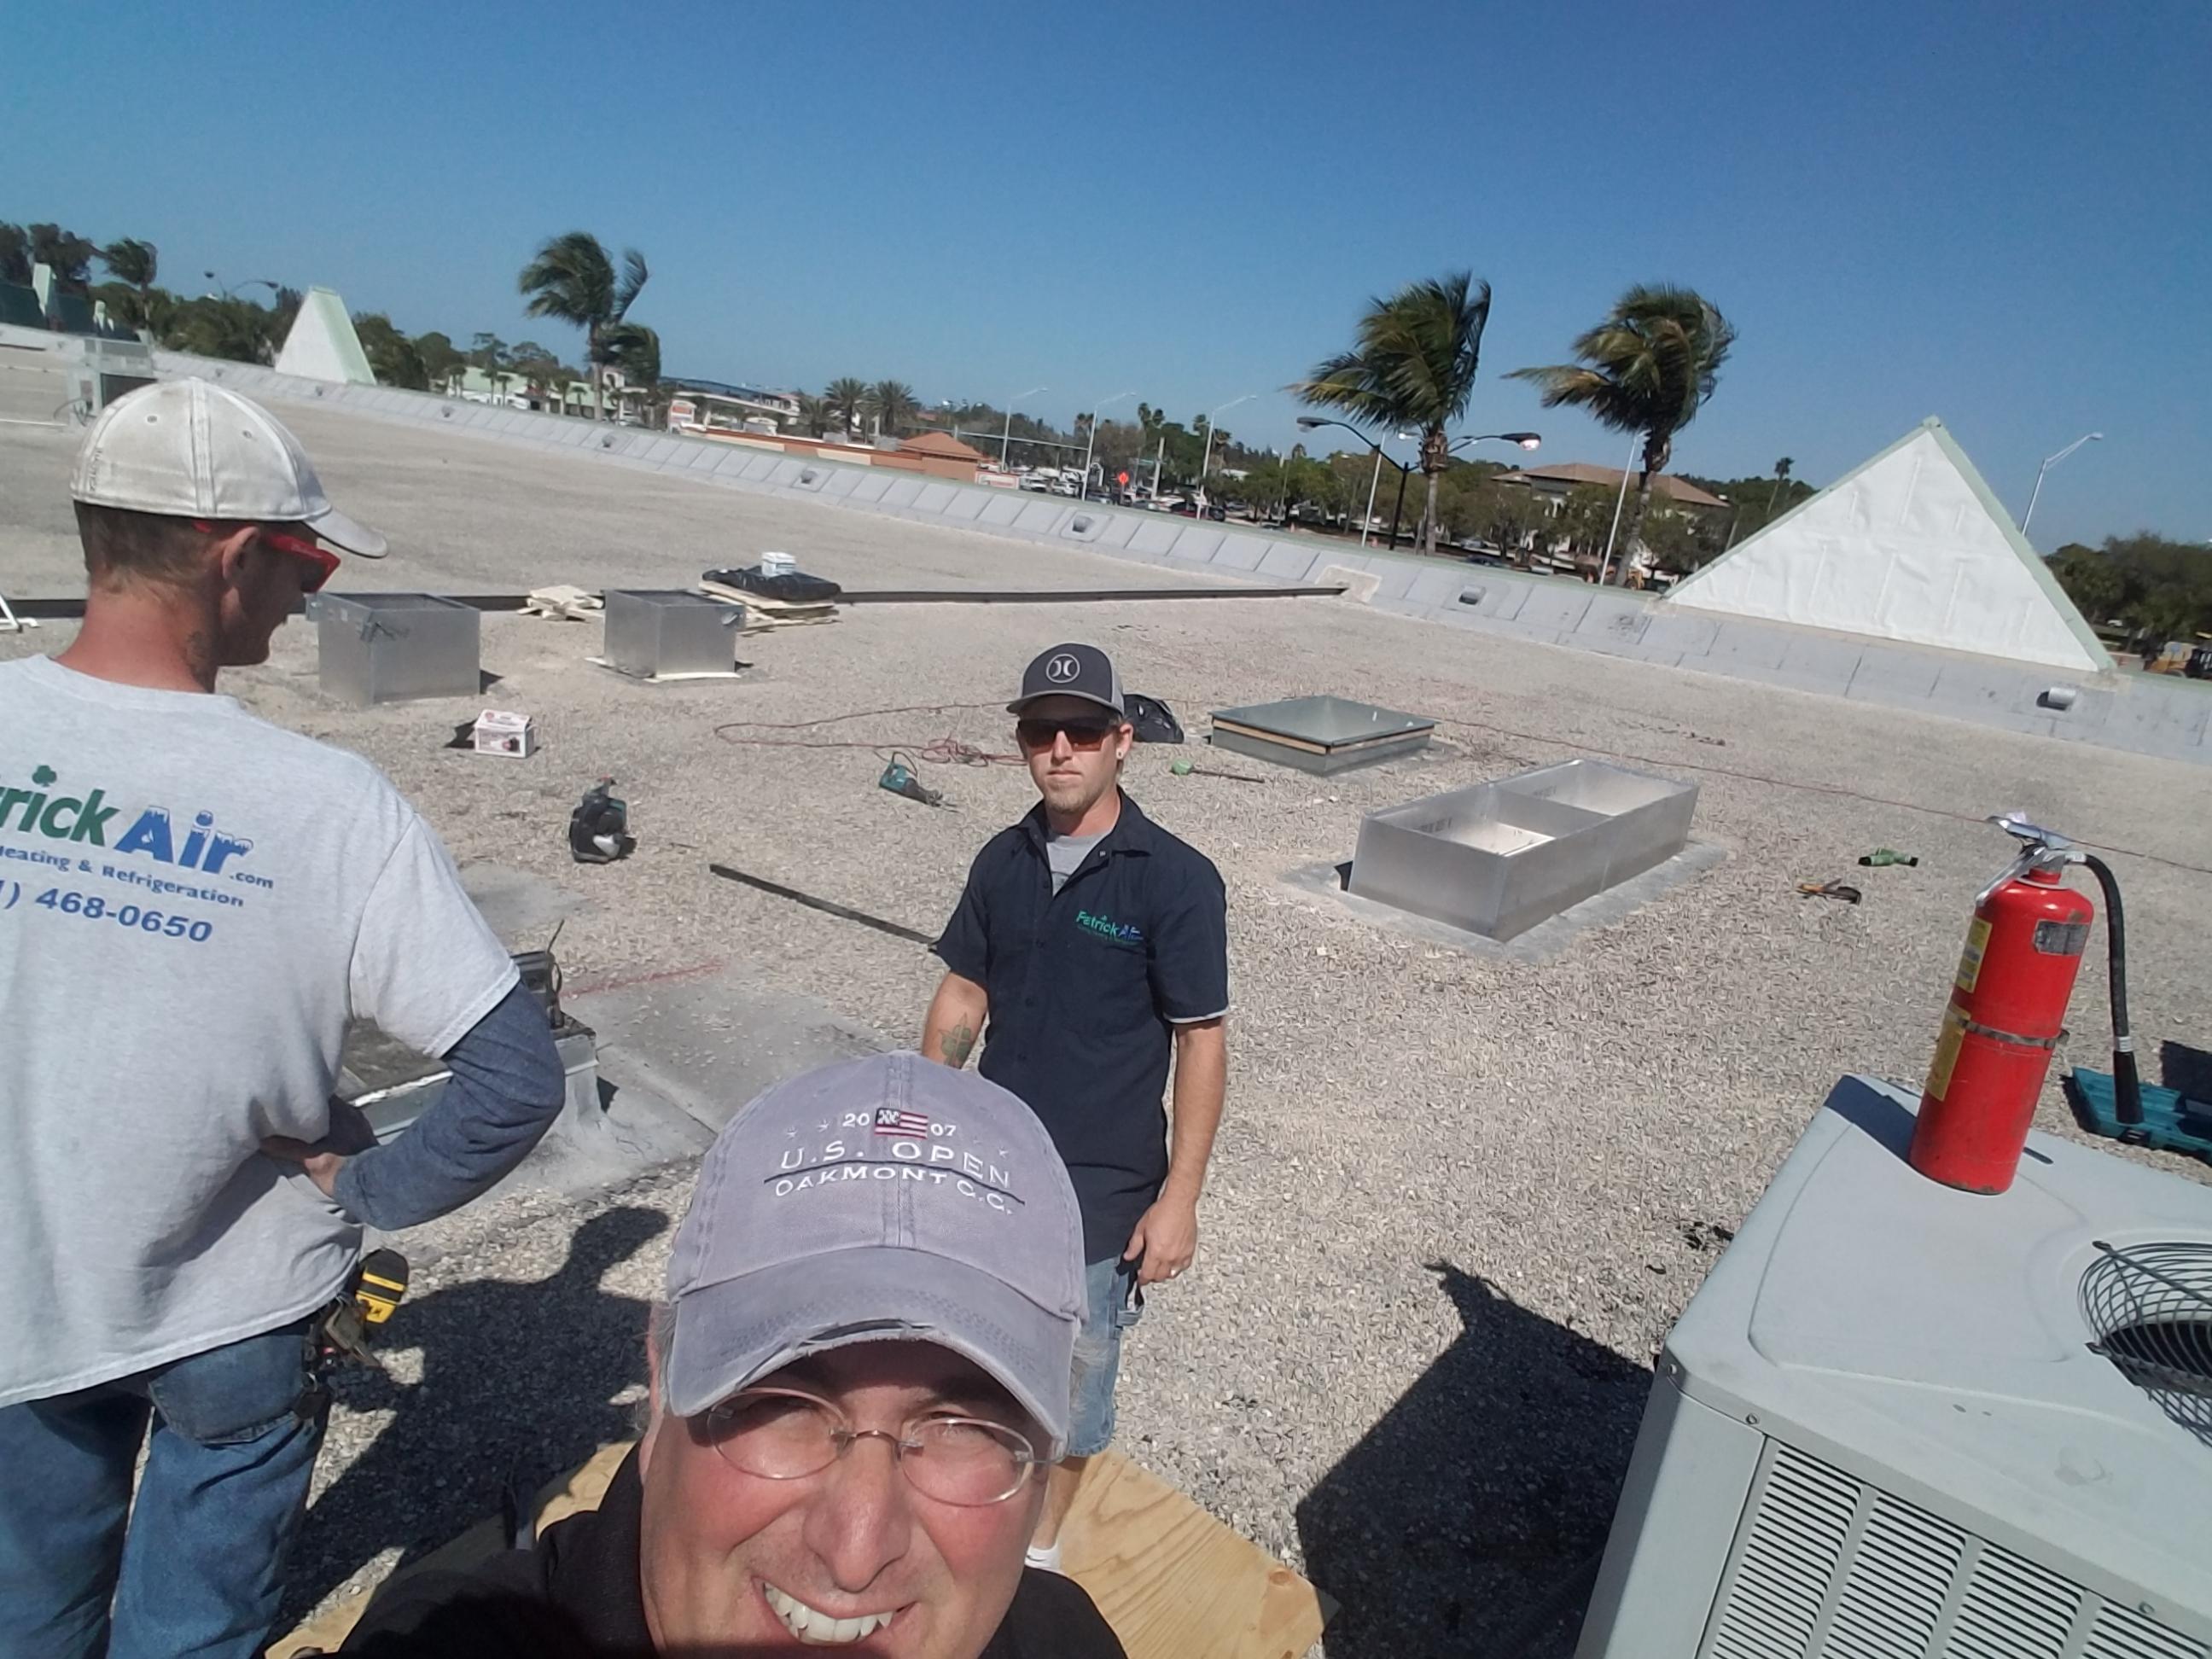 Commercial A/C Refrigeration Heating Installation Venice, FL Sarasota County